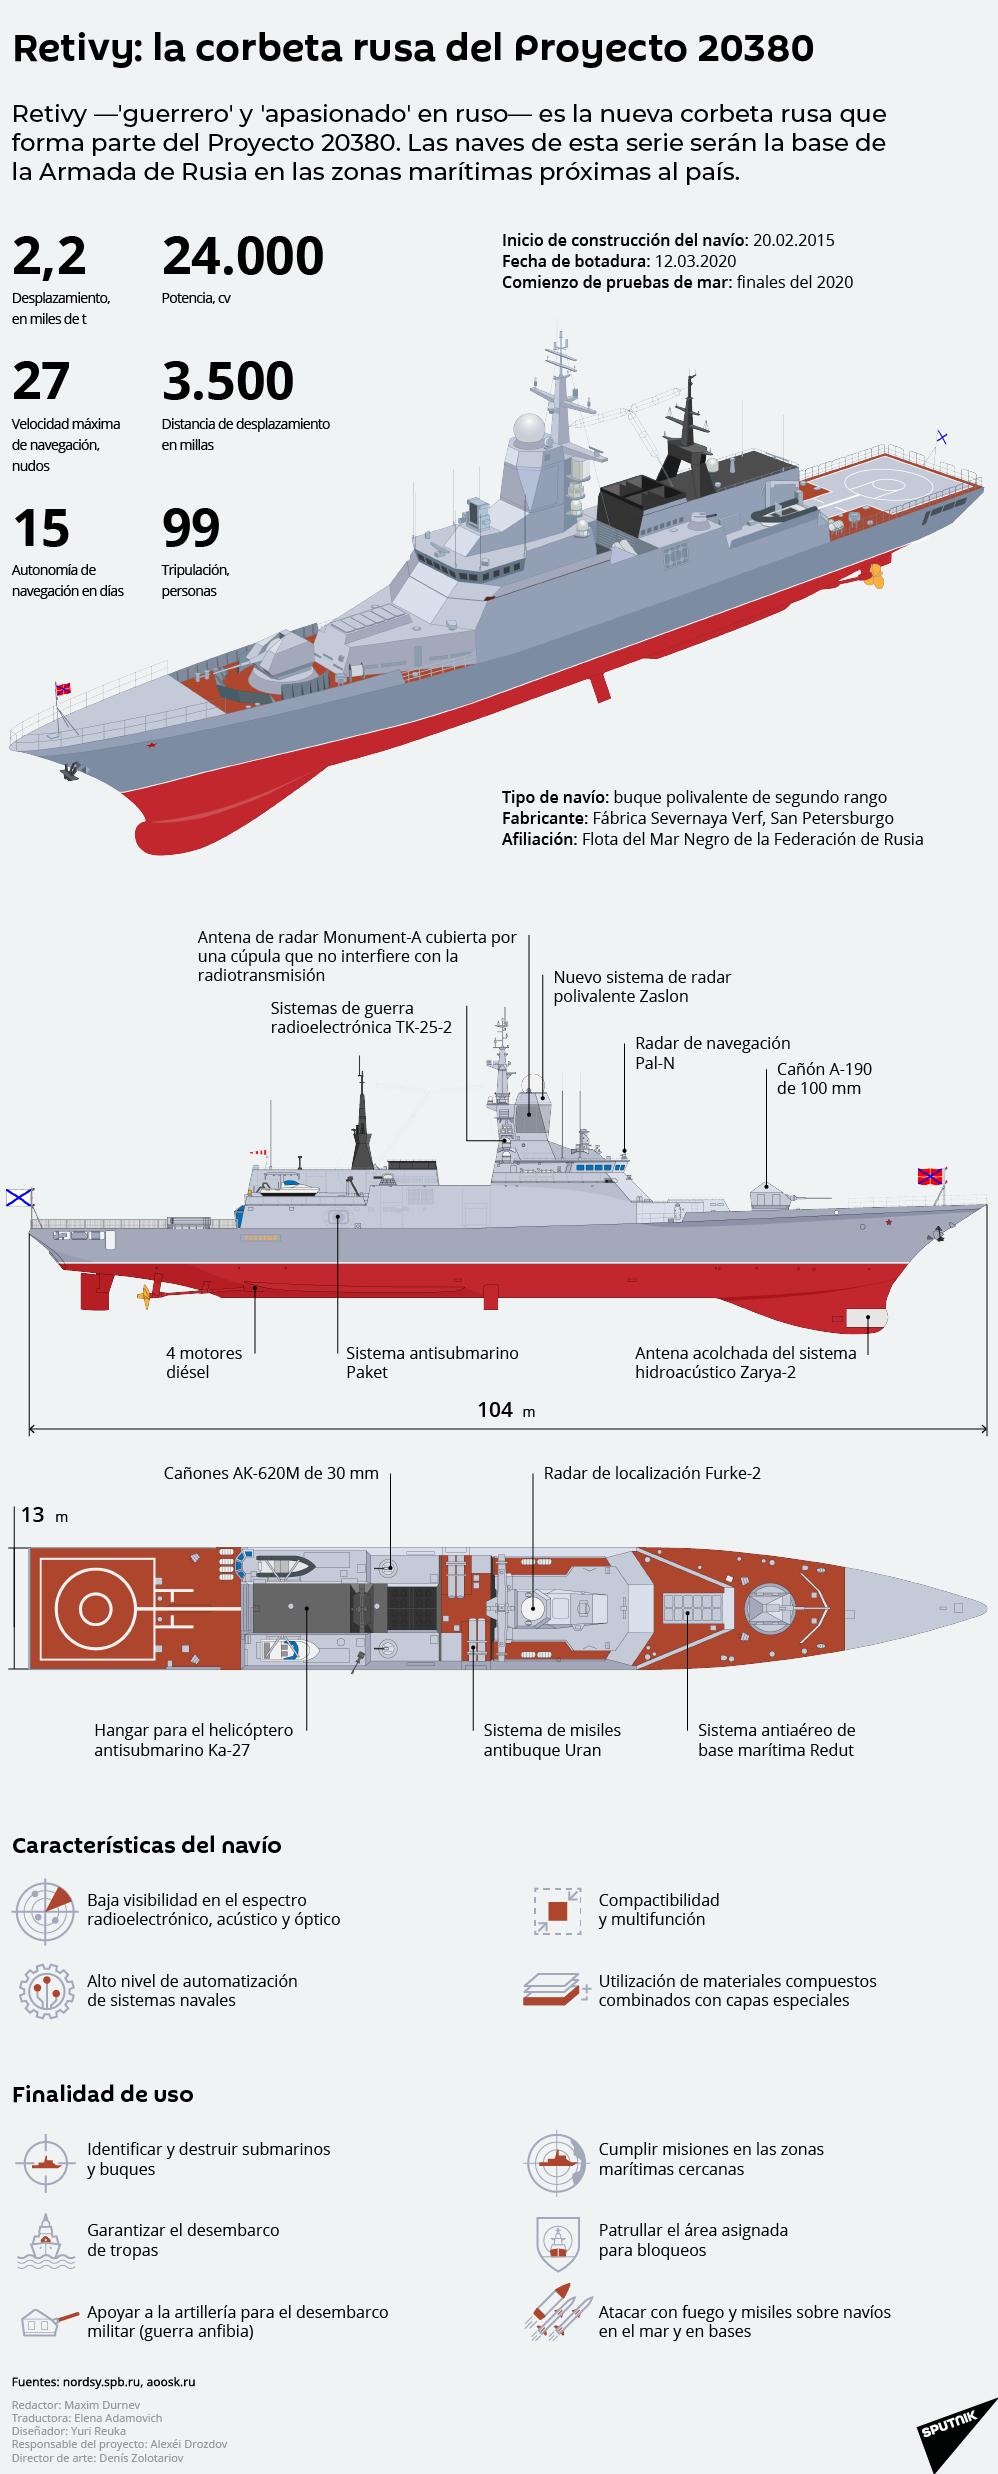 Retivy, el 'guerrero' de la Armada de Rusia - Sputnik Mundo